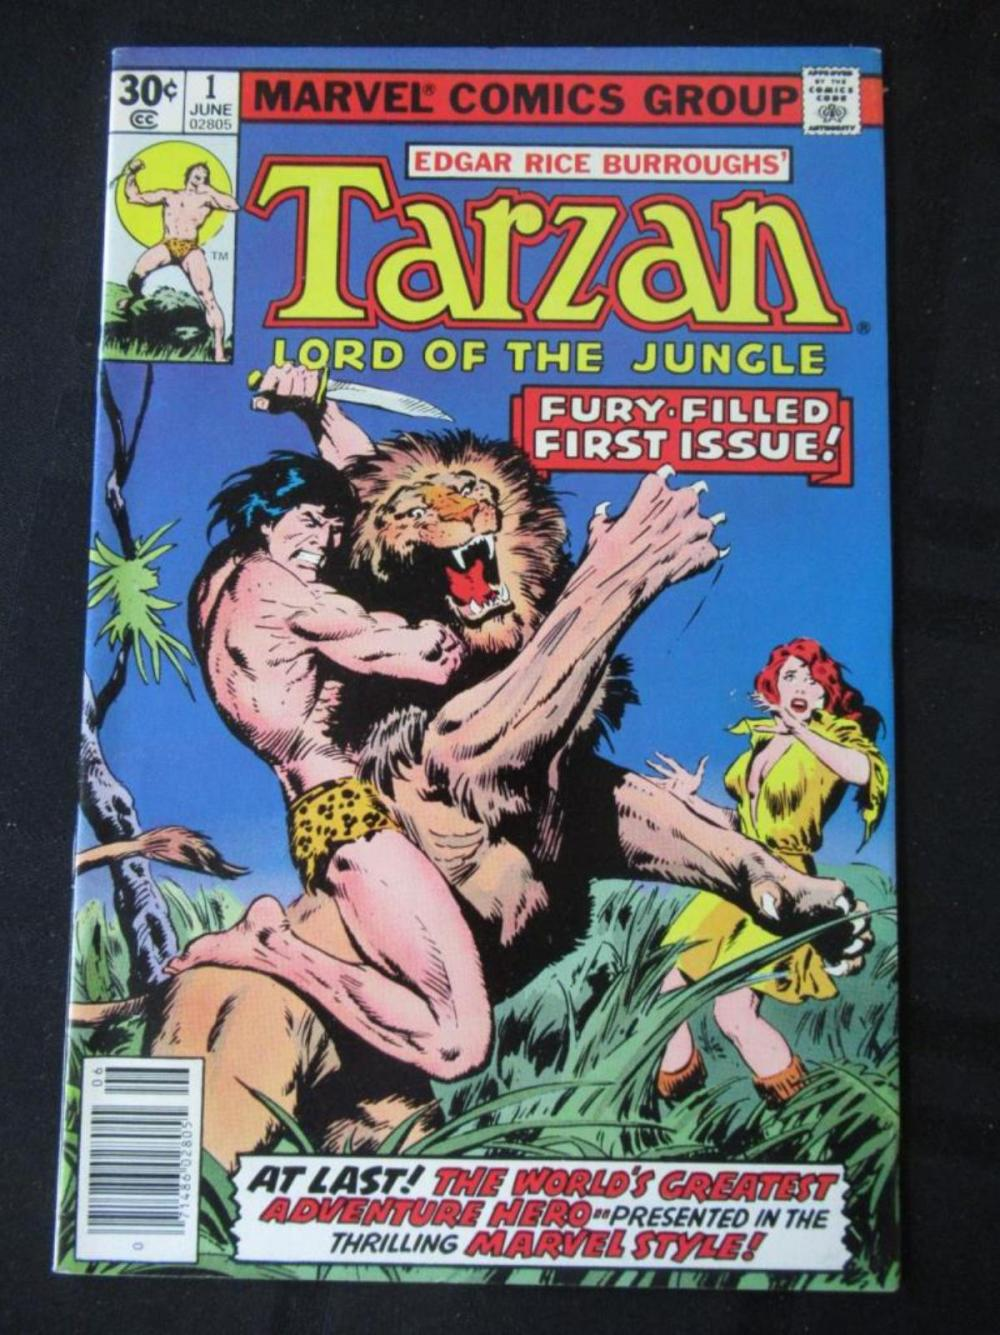 Tarzan Lord of the Jungle 30c #1 Fury Filled First